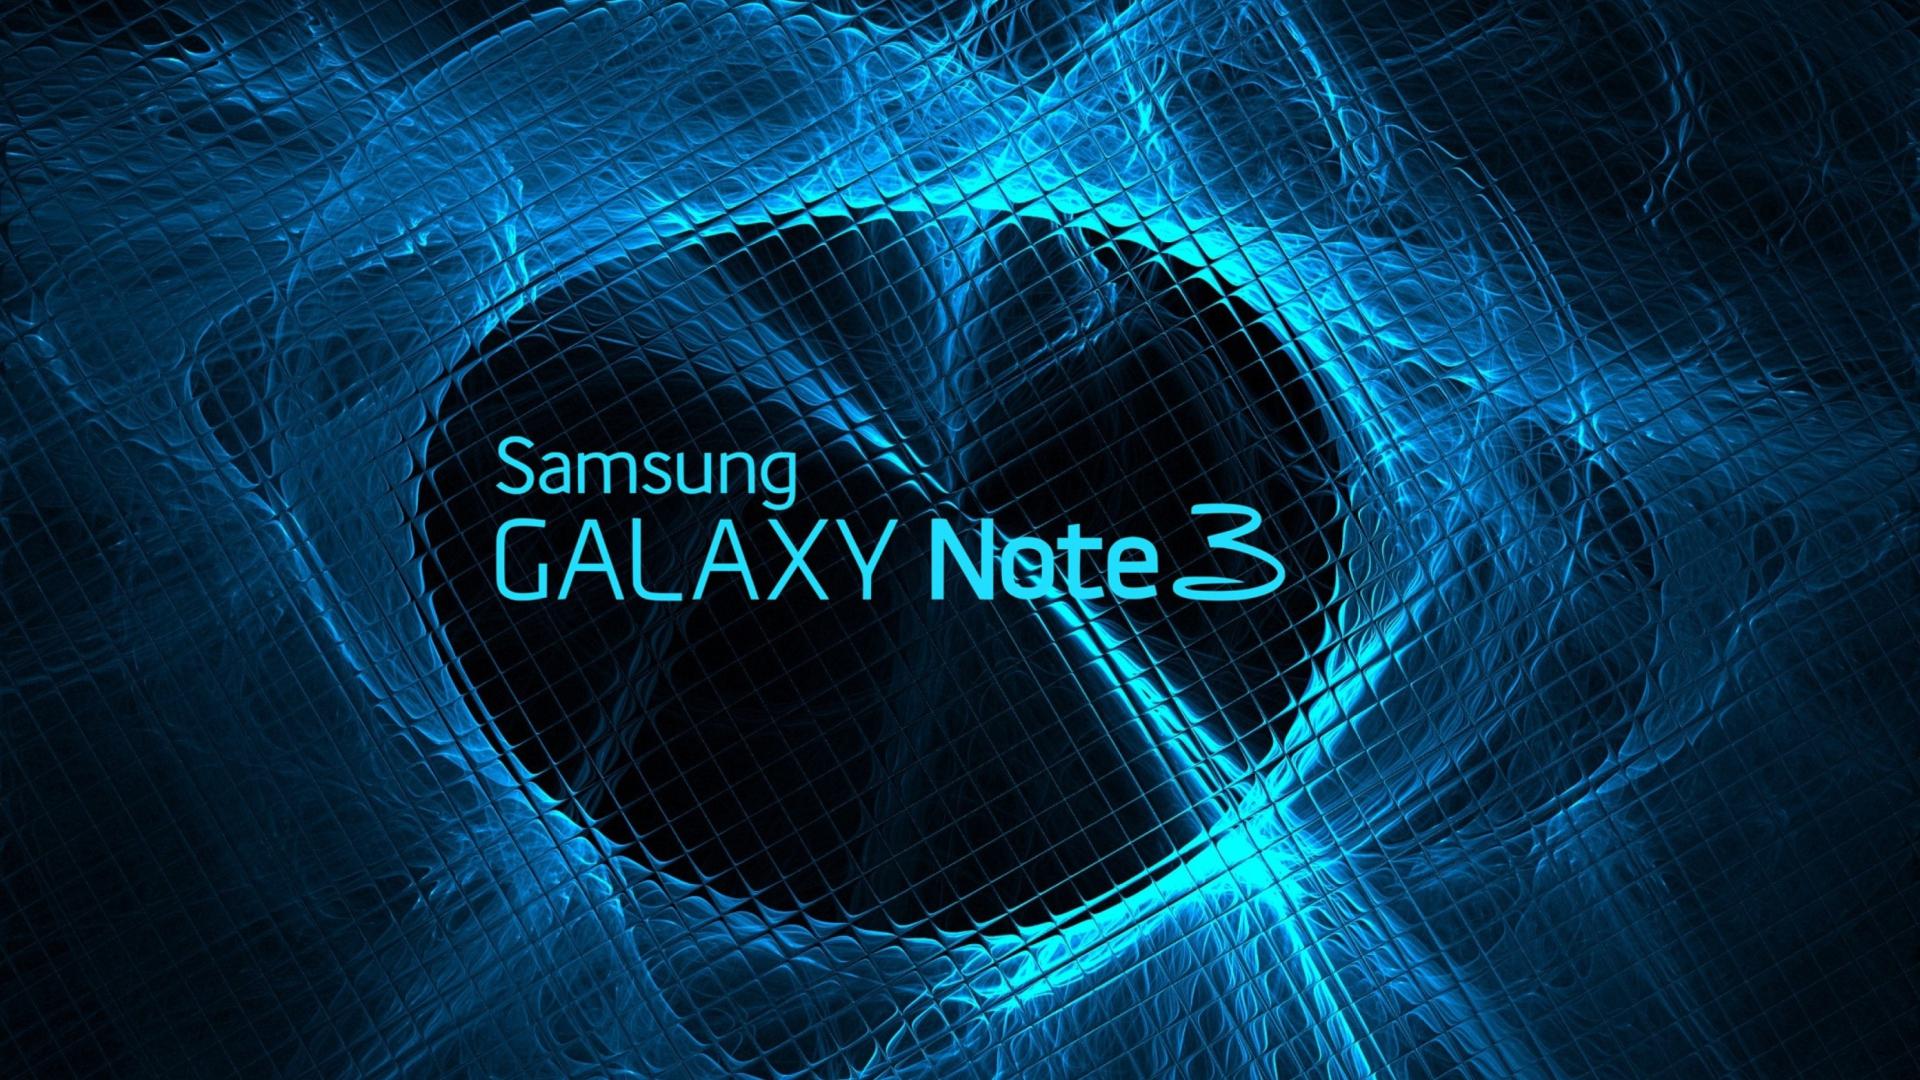 Samsung galaxy note 3 wallpaper for desktop 1920x1080 full hd - Galaxy note 3 wallpaper nature ...